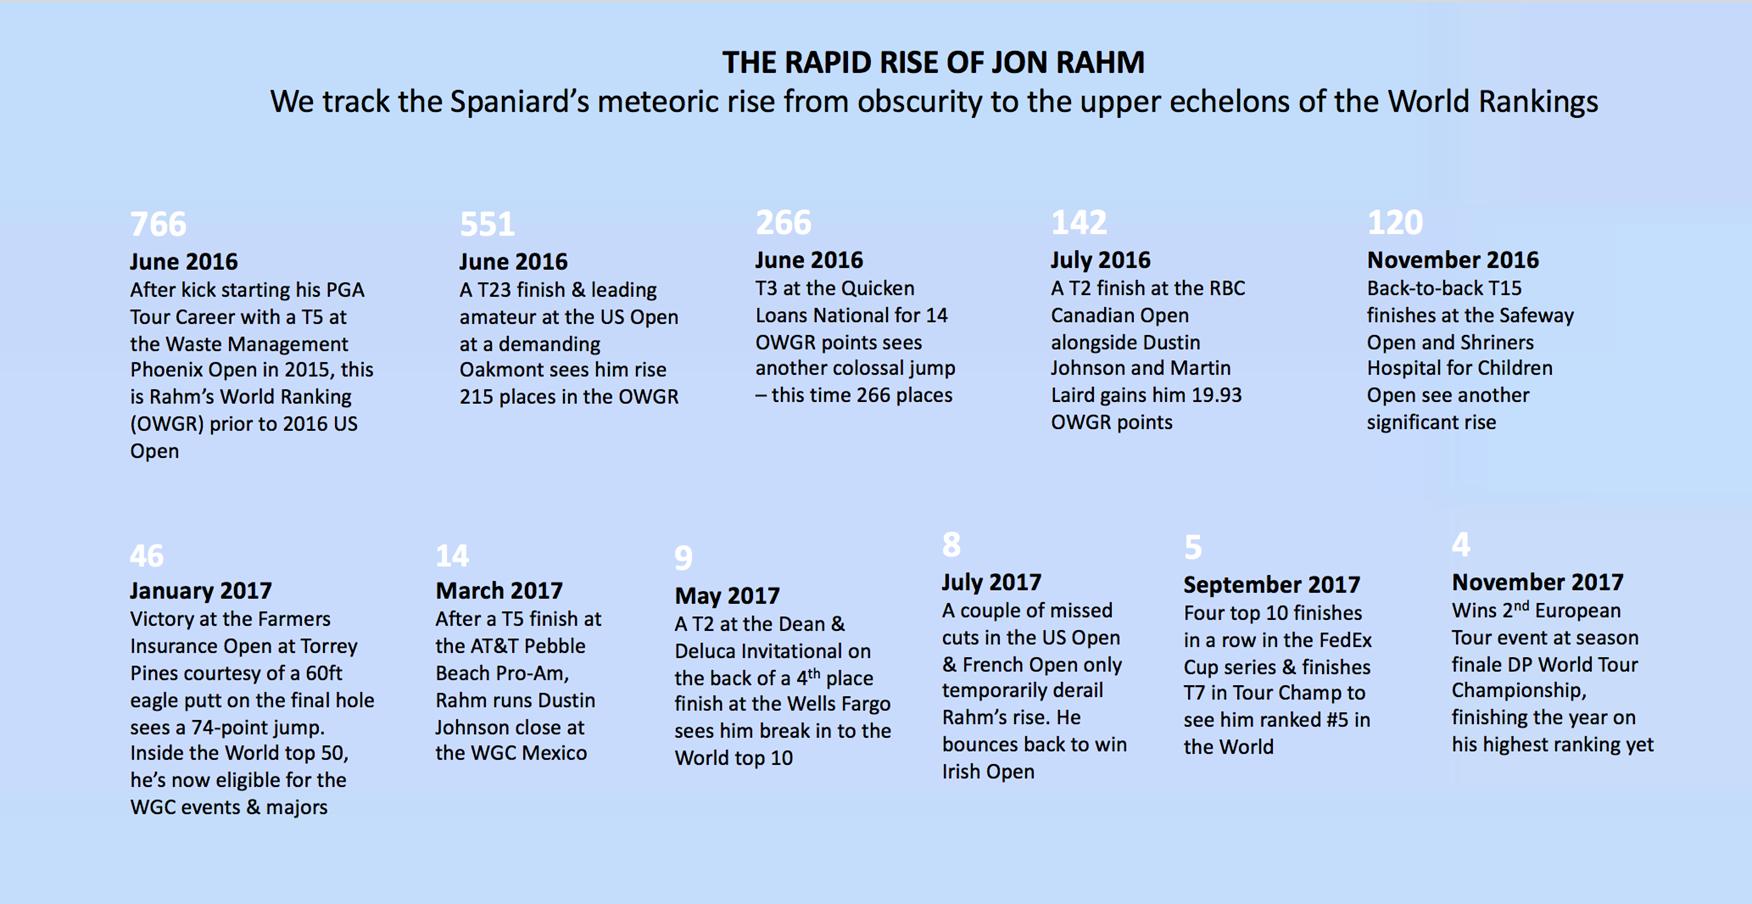 Jon Rahm